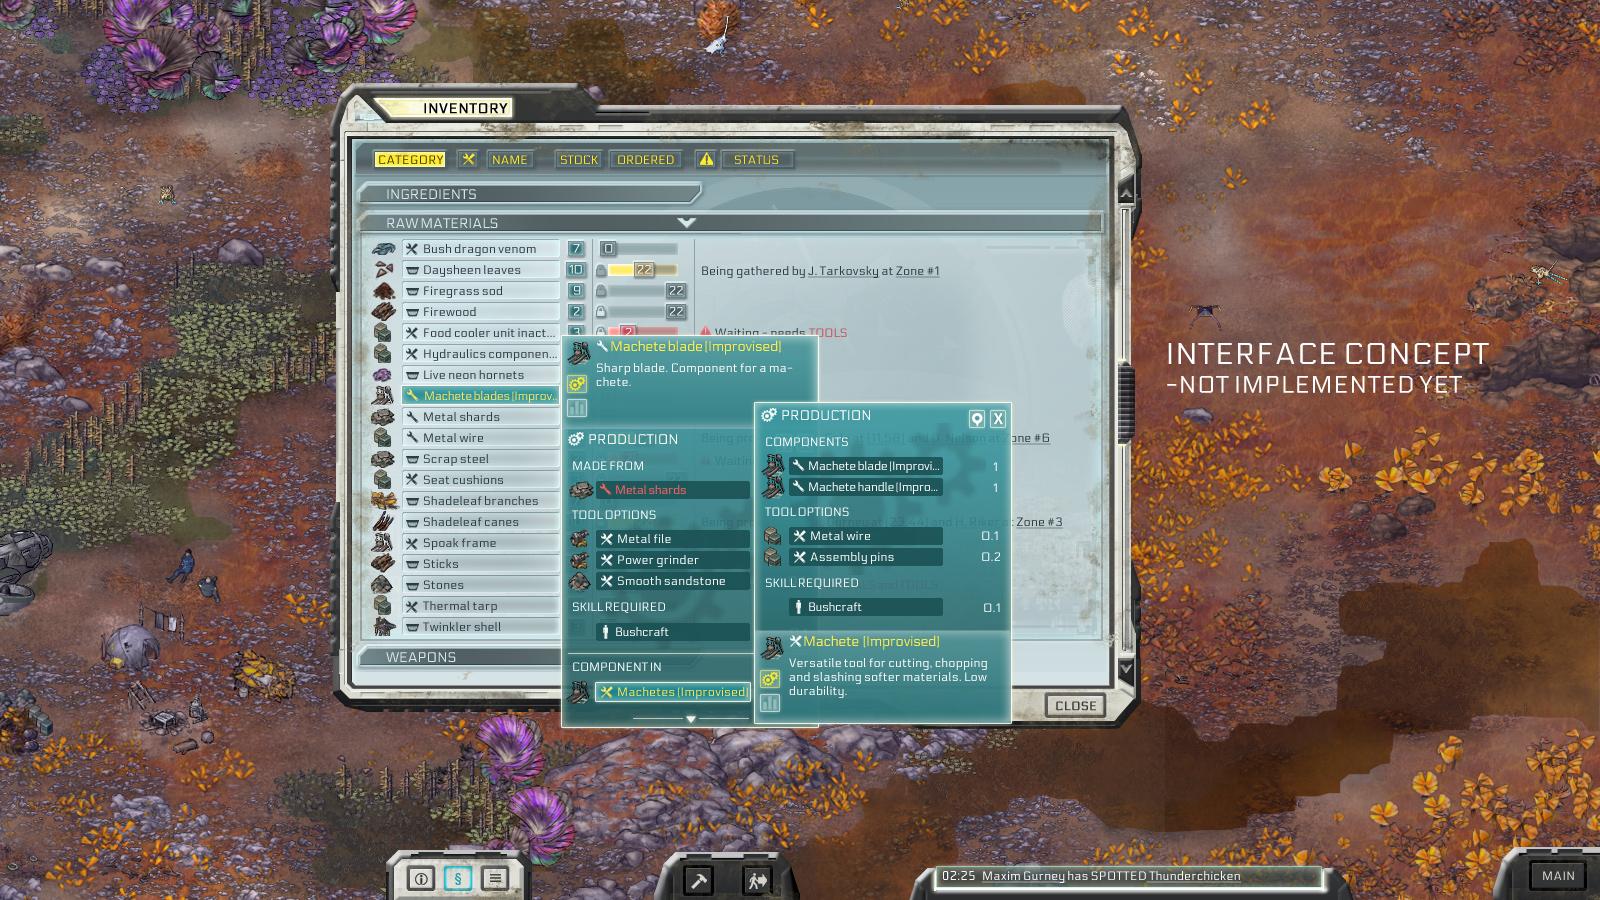 inventoryui_crashsite.jpg